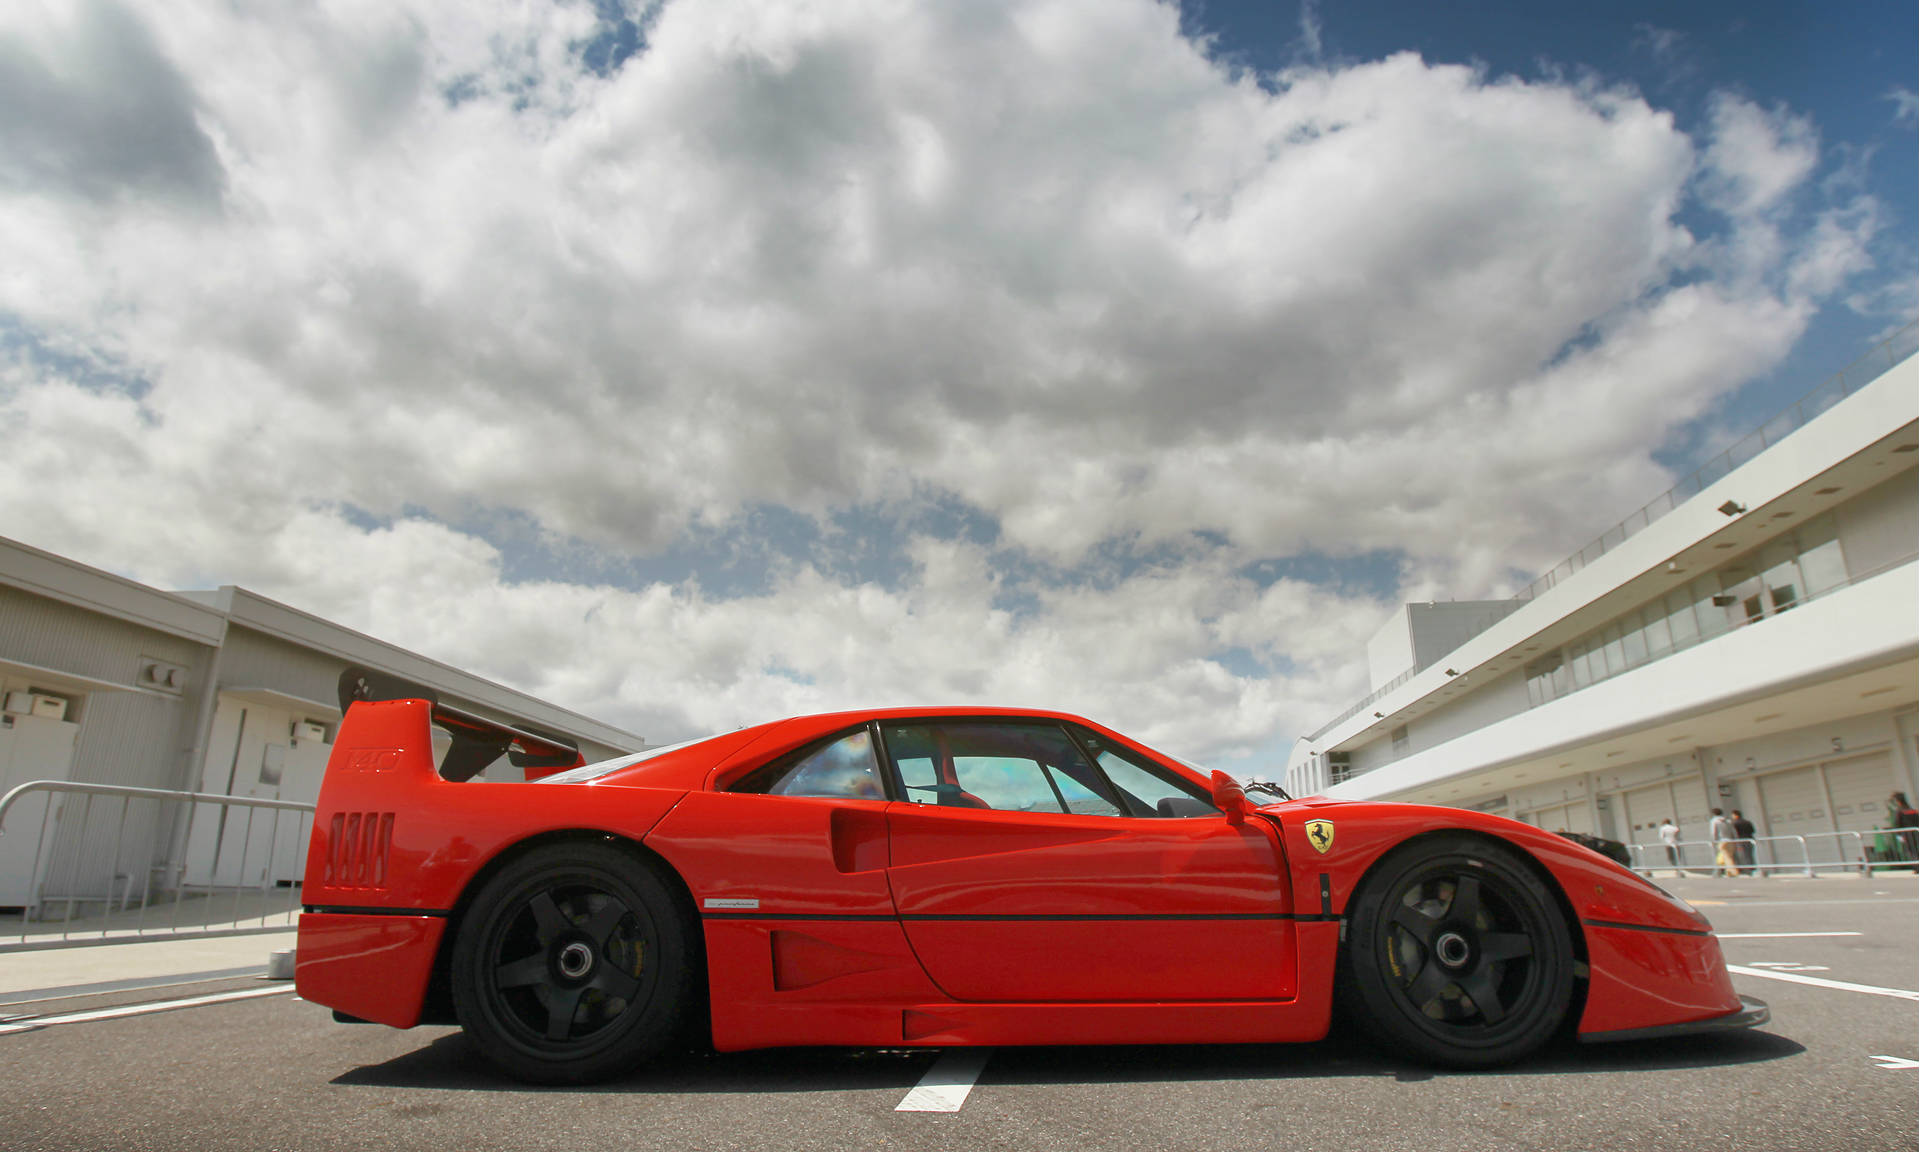 2012 Ferrari 458 Italia besides 1972 Nissan Skyline GTR additionally 1 5 Scale RC Buggy as well Nissan 350Z RC Car likewise Ferrari F40 Lm. on rc drift cars